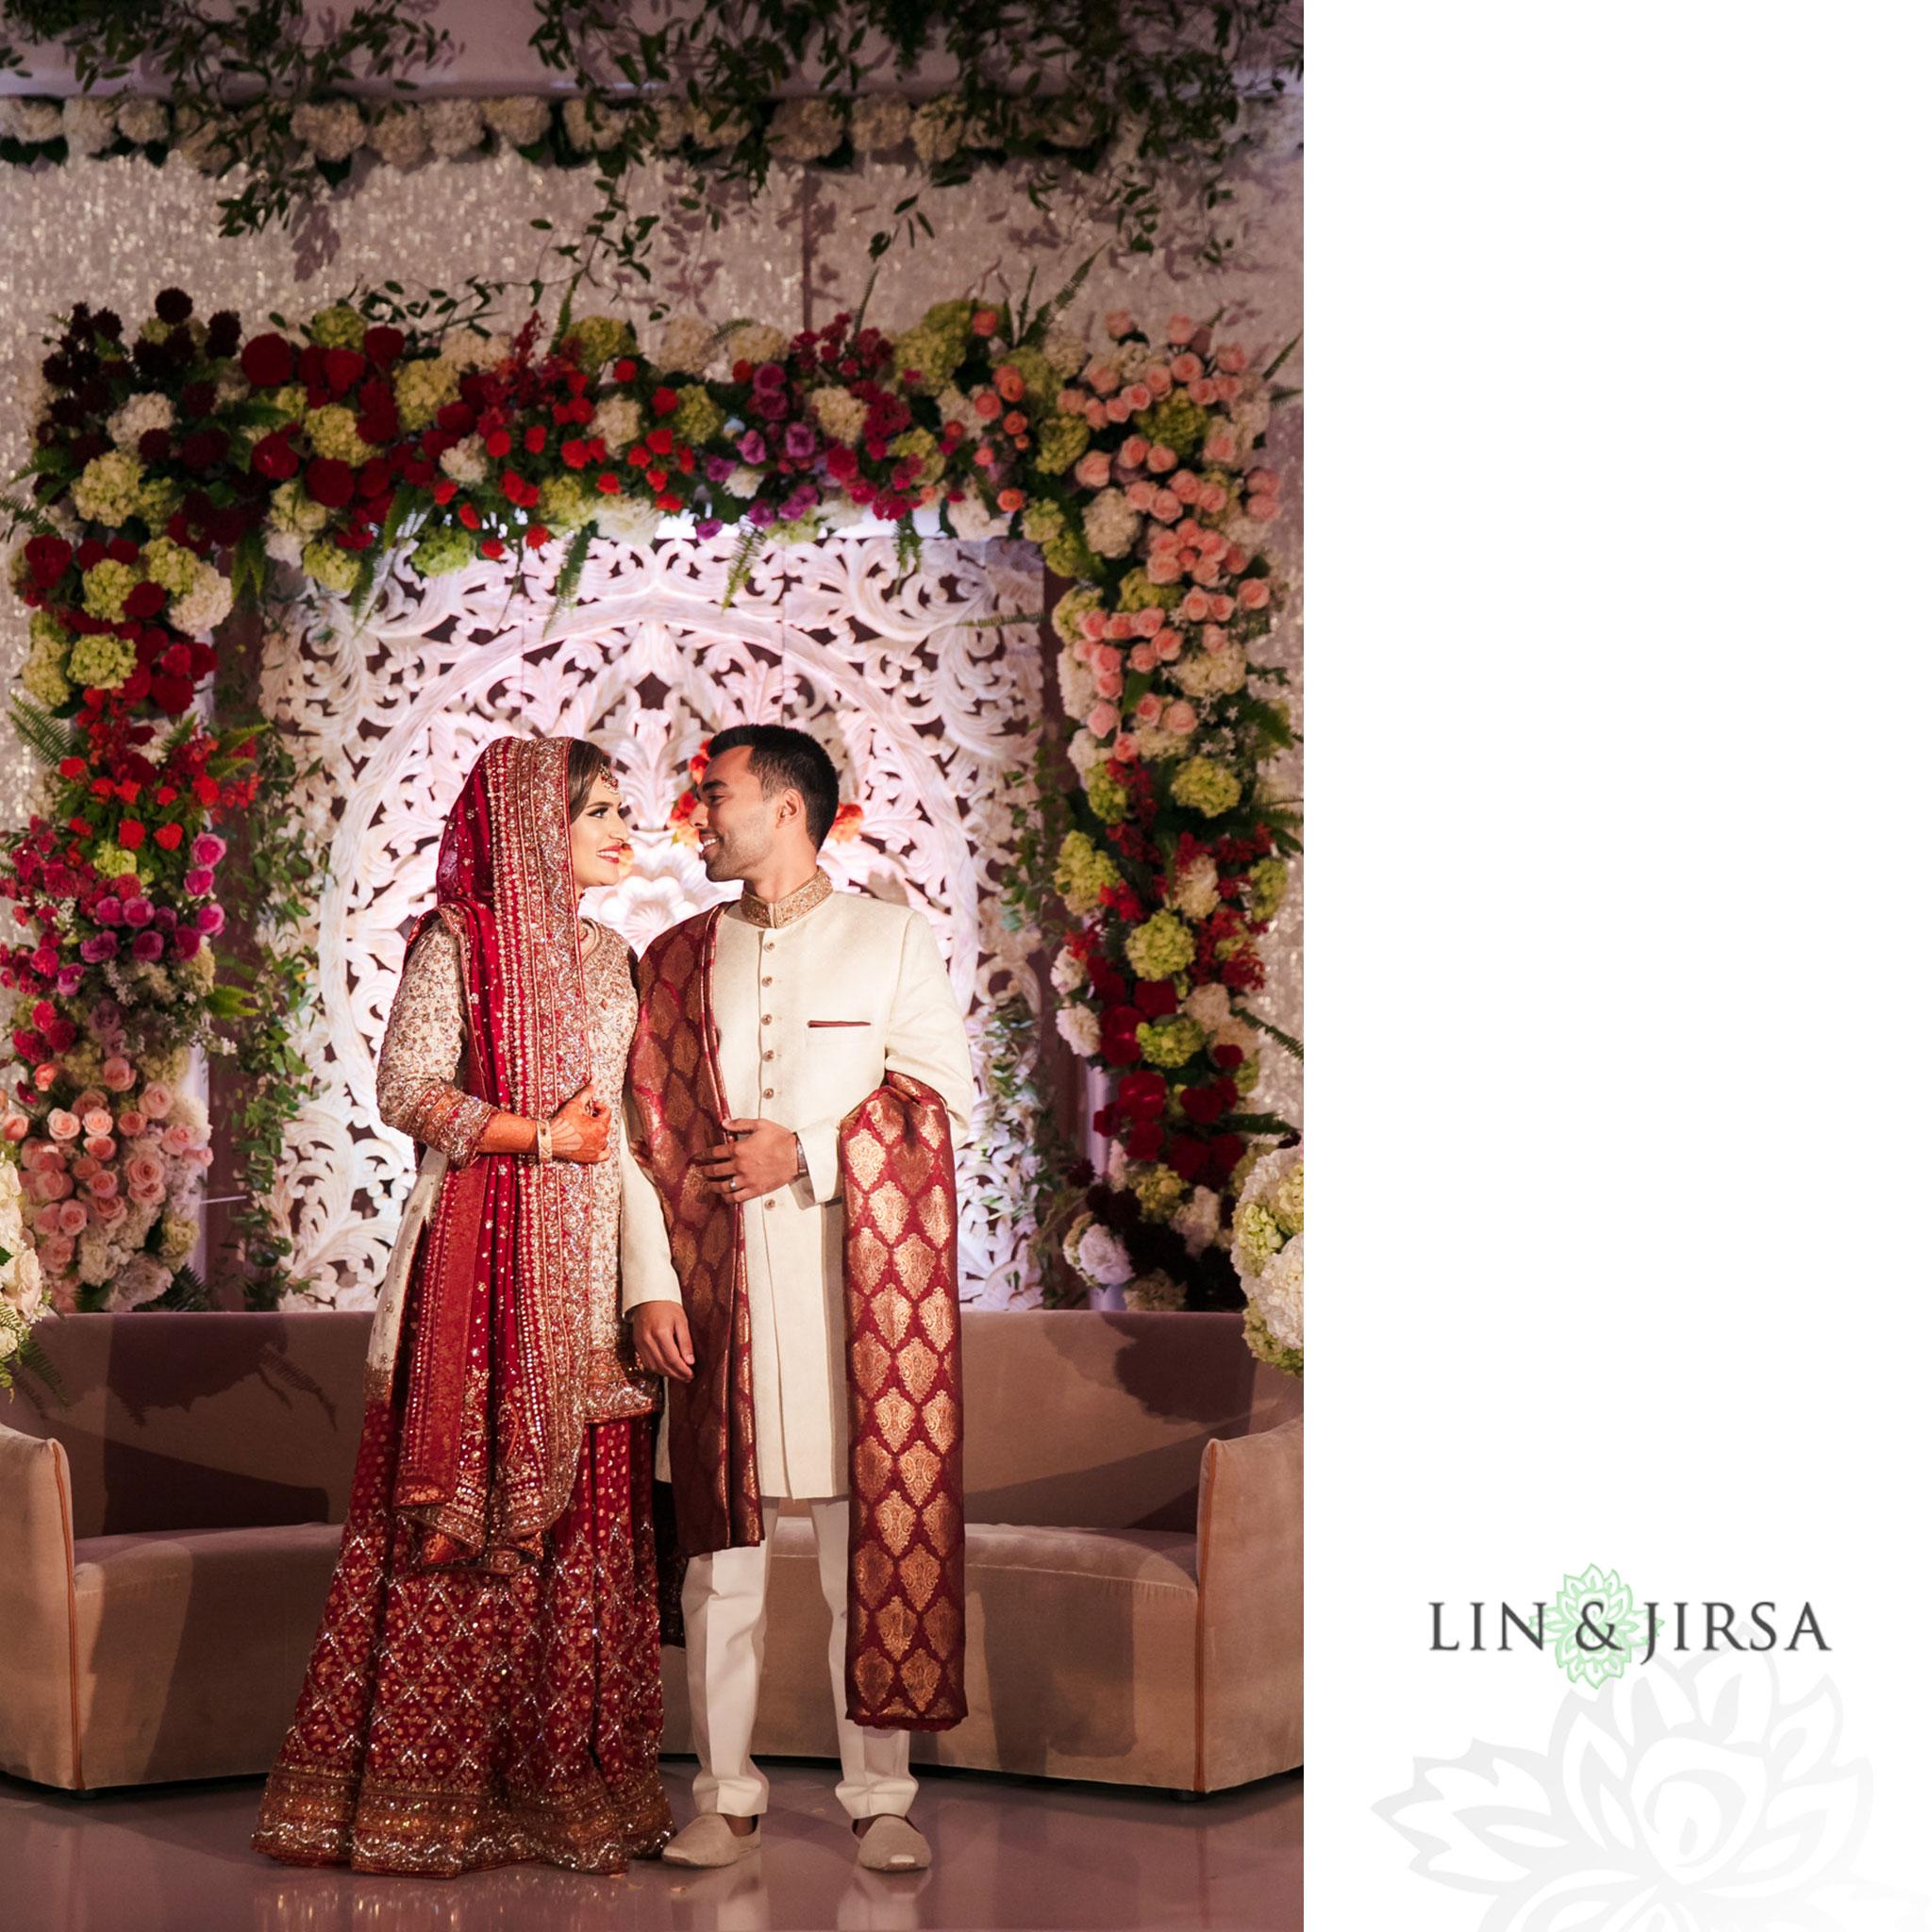 031 pasea hotel huntington beach pakistani muslim wedding photography